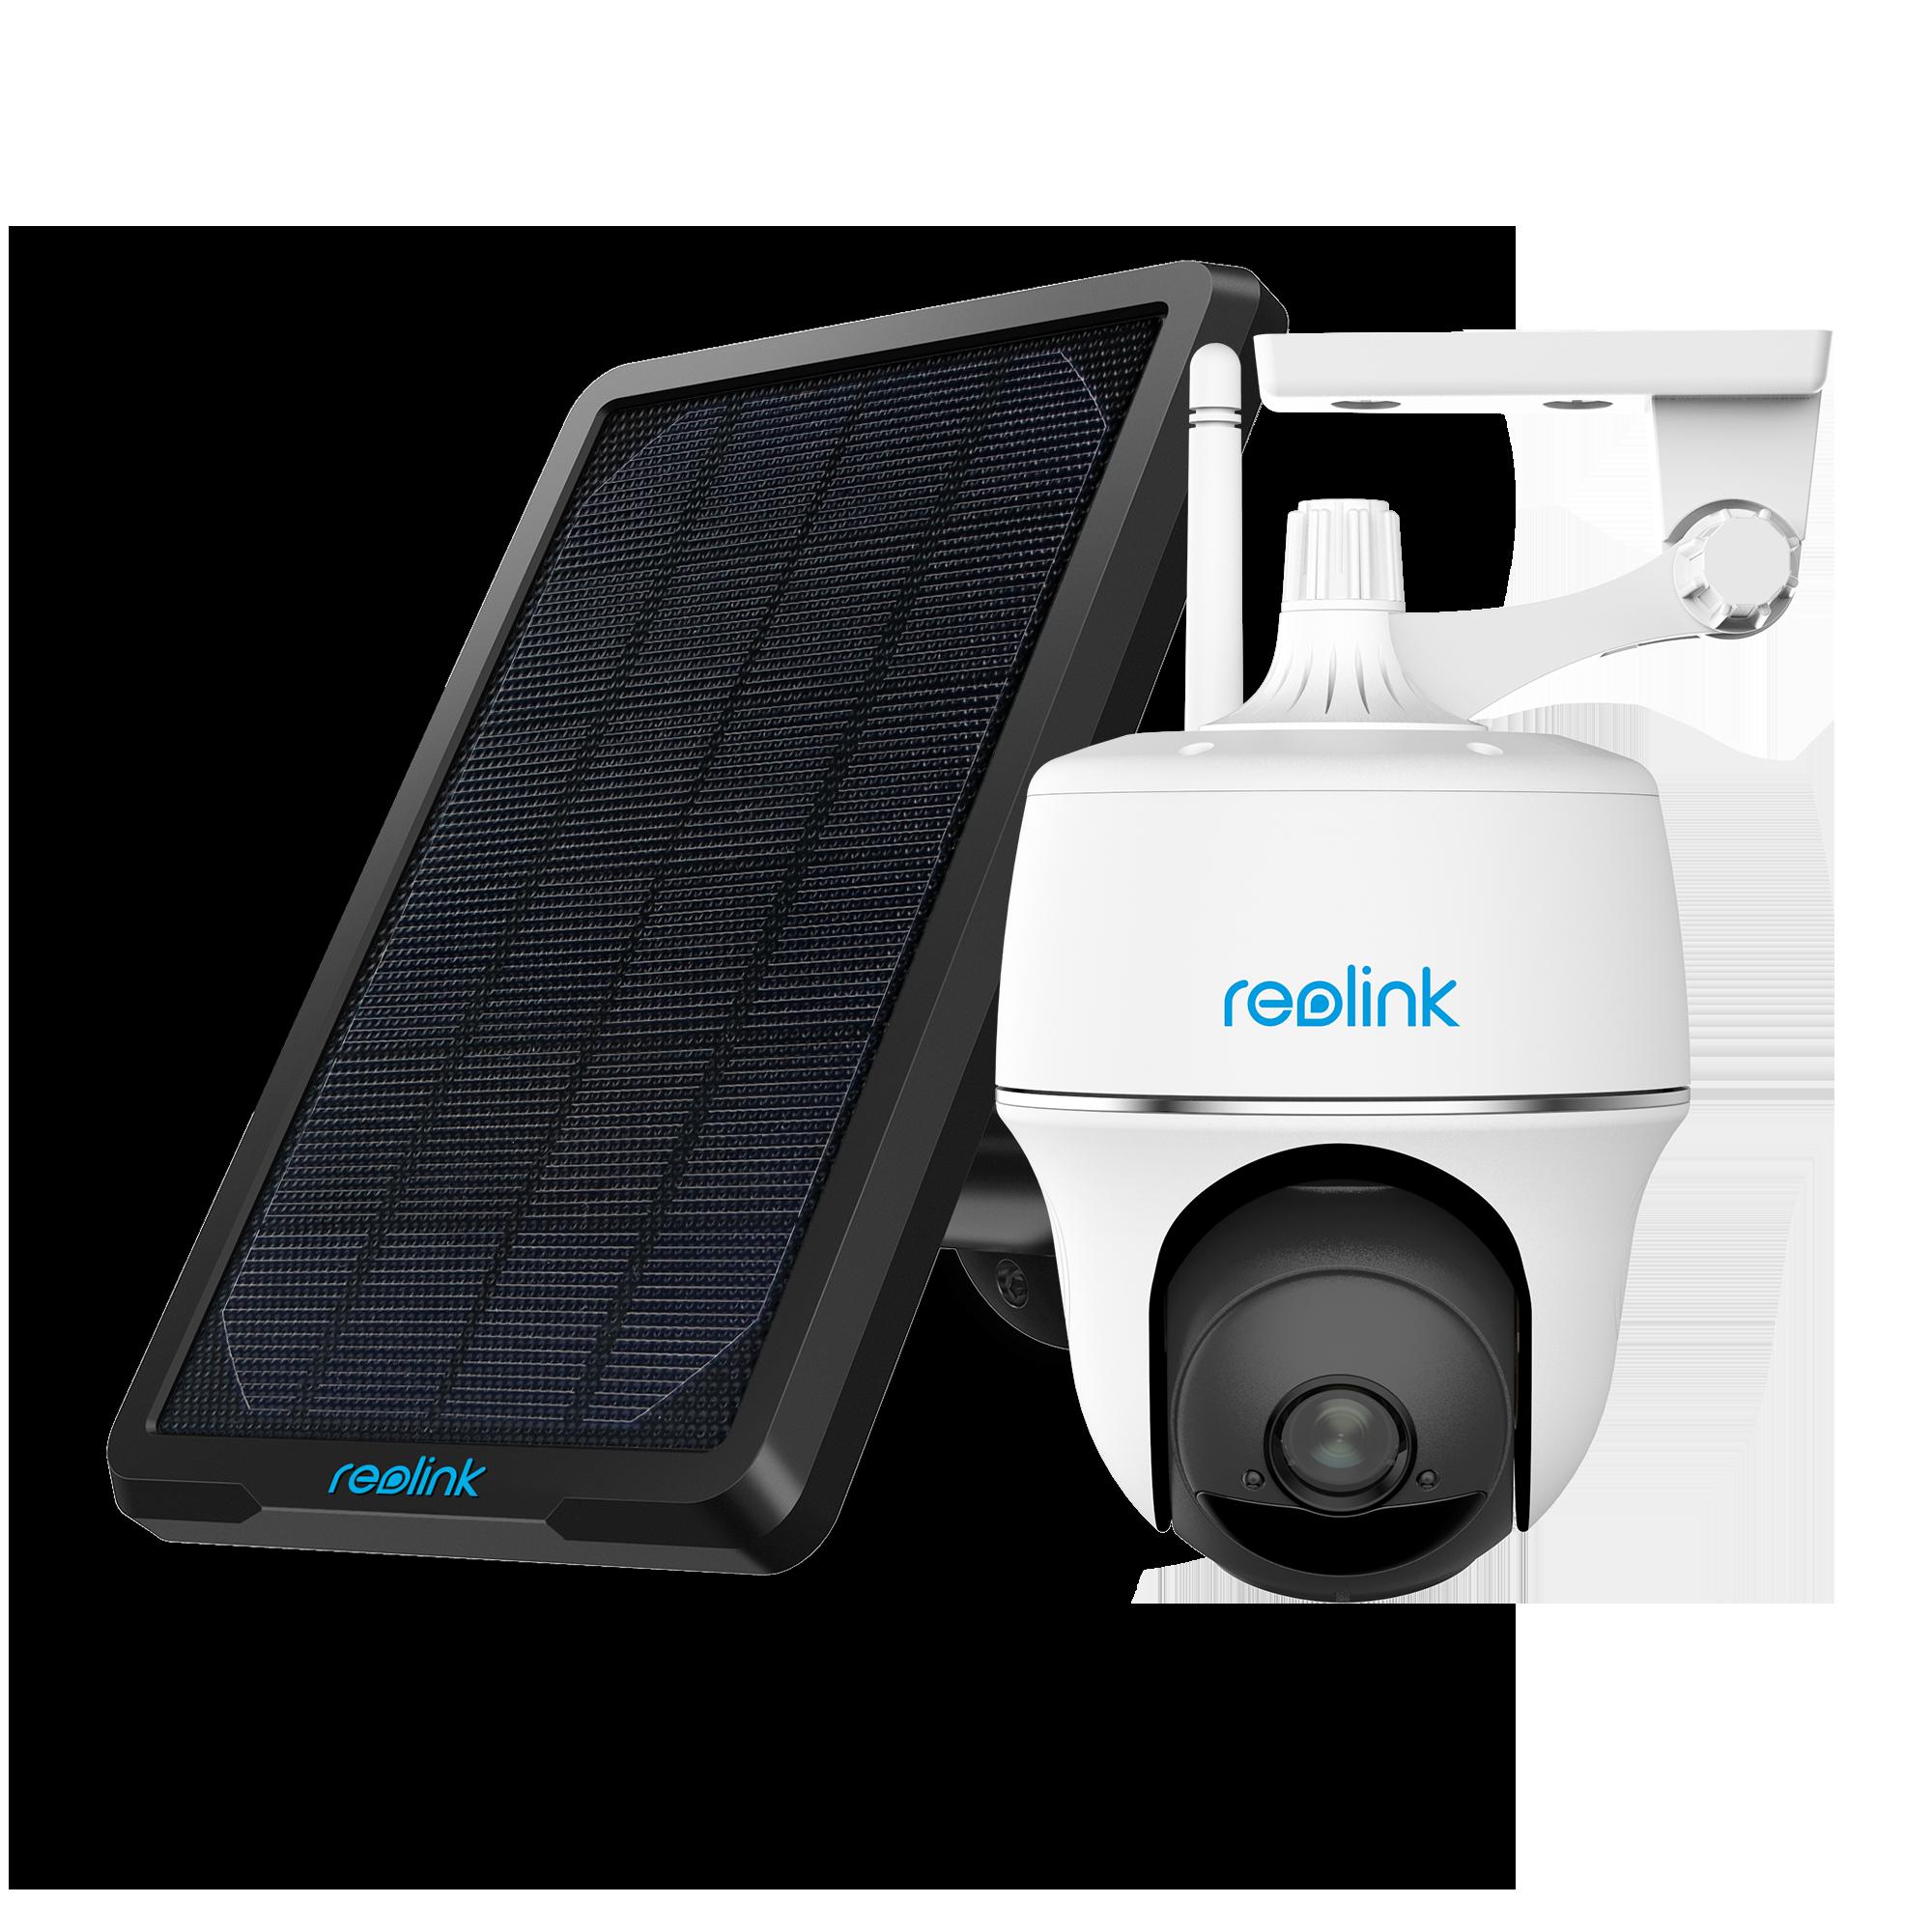 Reolink Argus PT & Solar Panel Home Surveillance IP Camera, Starlight Color Night Vision, PIR Motion Detection, Pan Tilt, 1080p Full HD